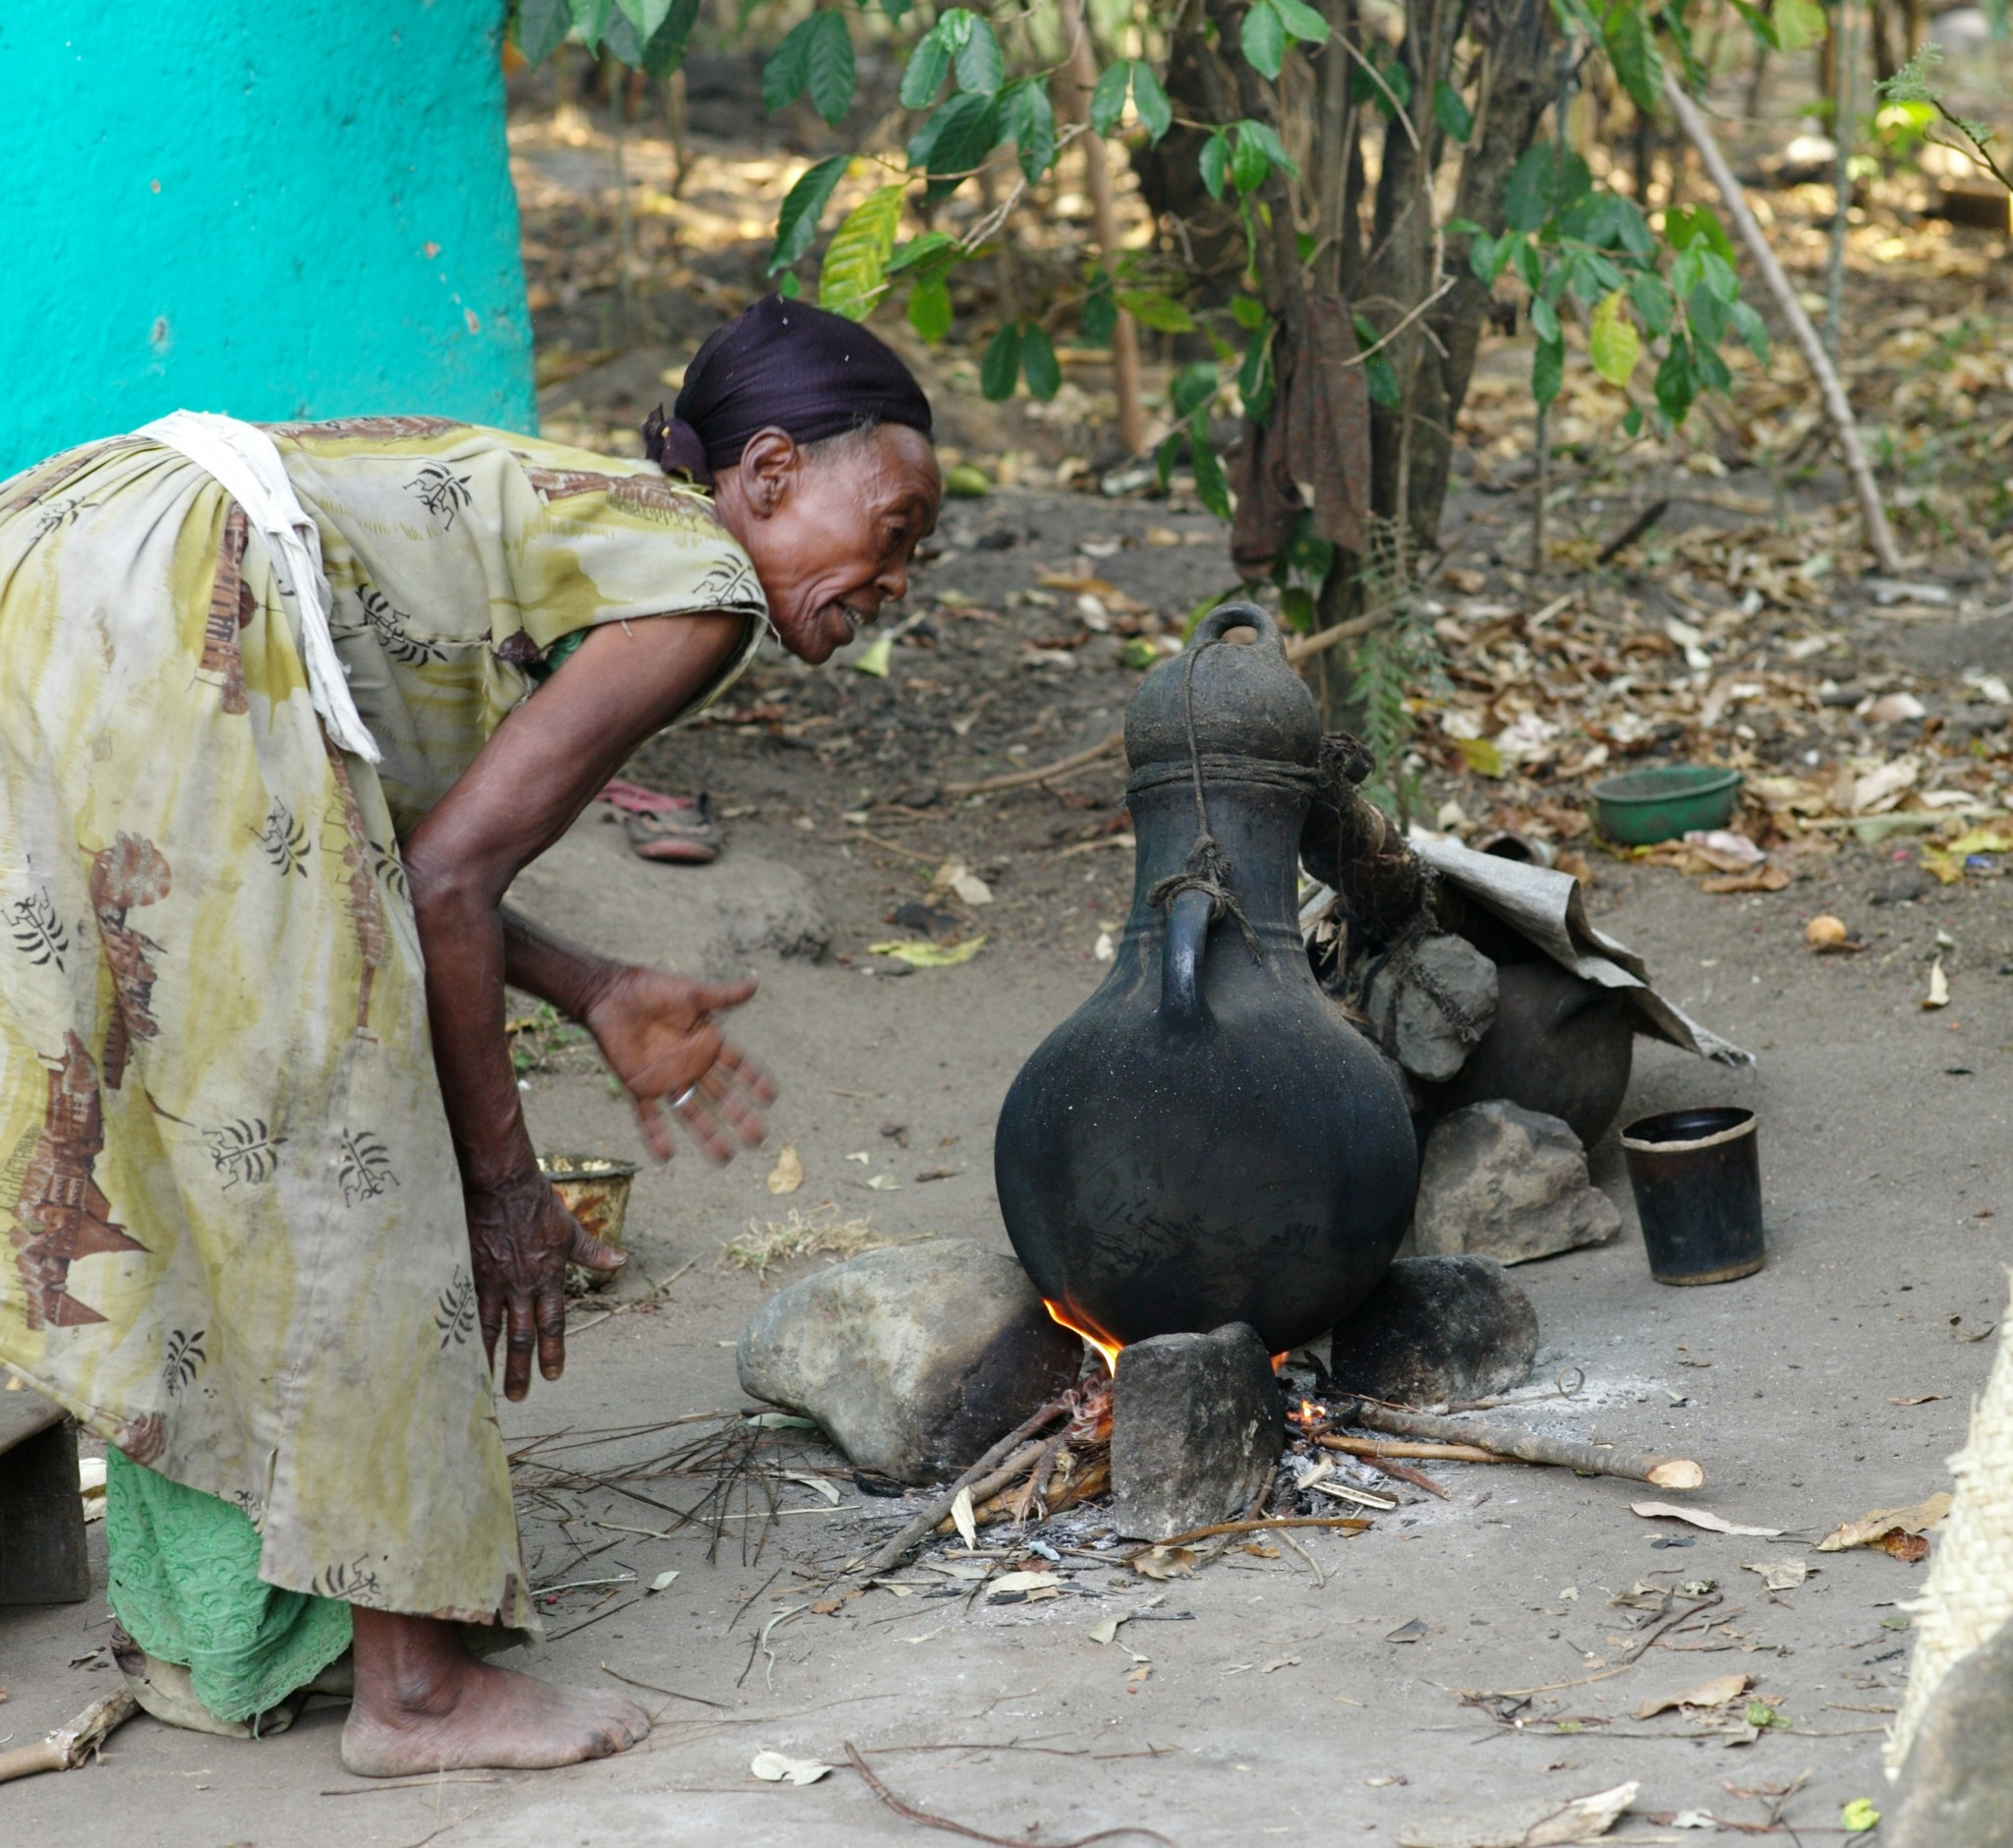 Ari woman making local alcohol